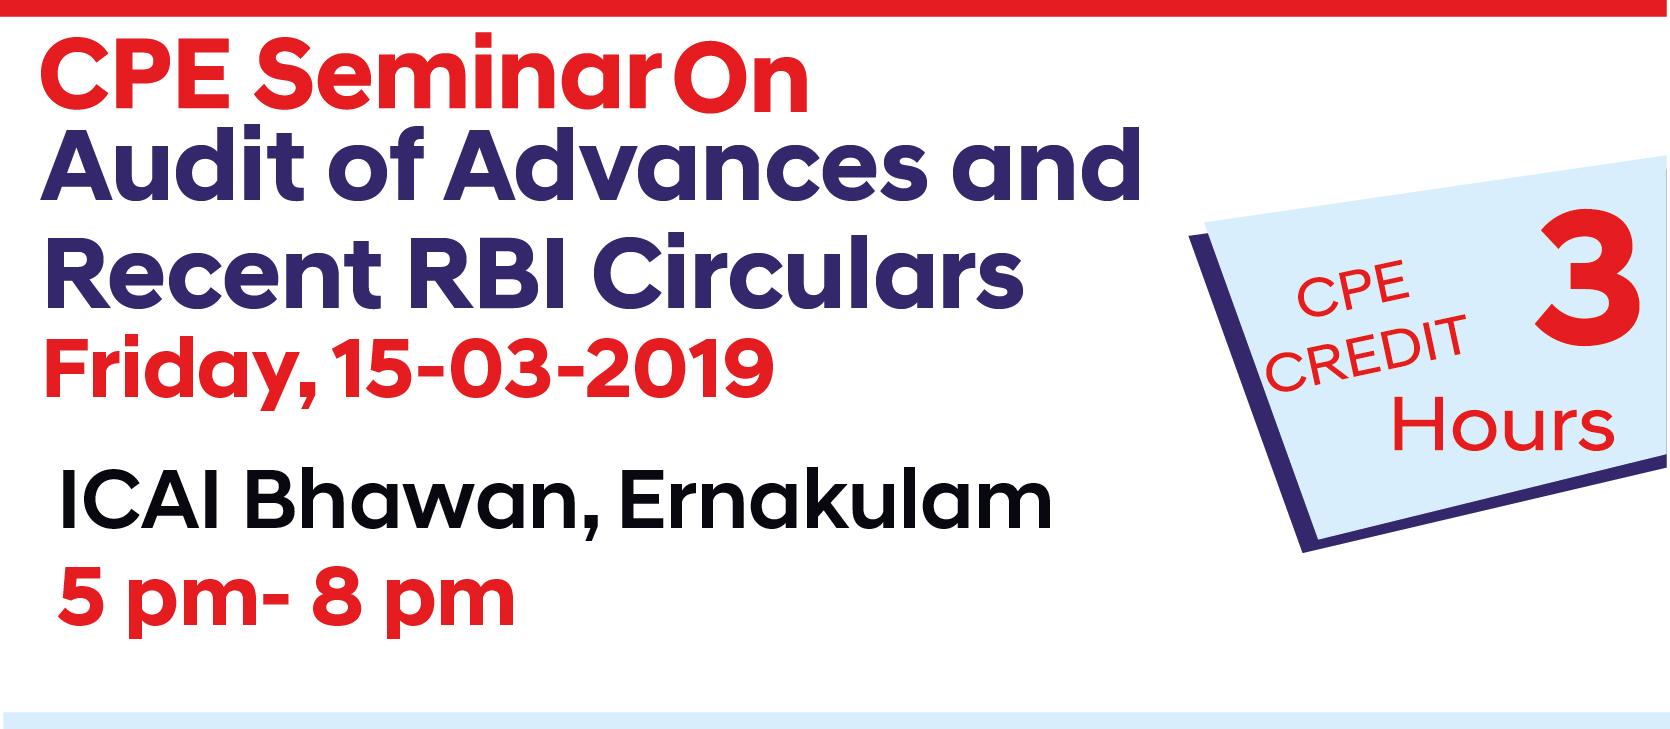 CPE Seminar on Audit of Advances and Recent RBI Circulars